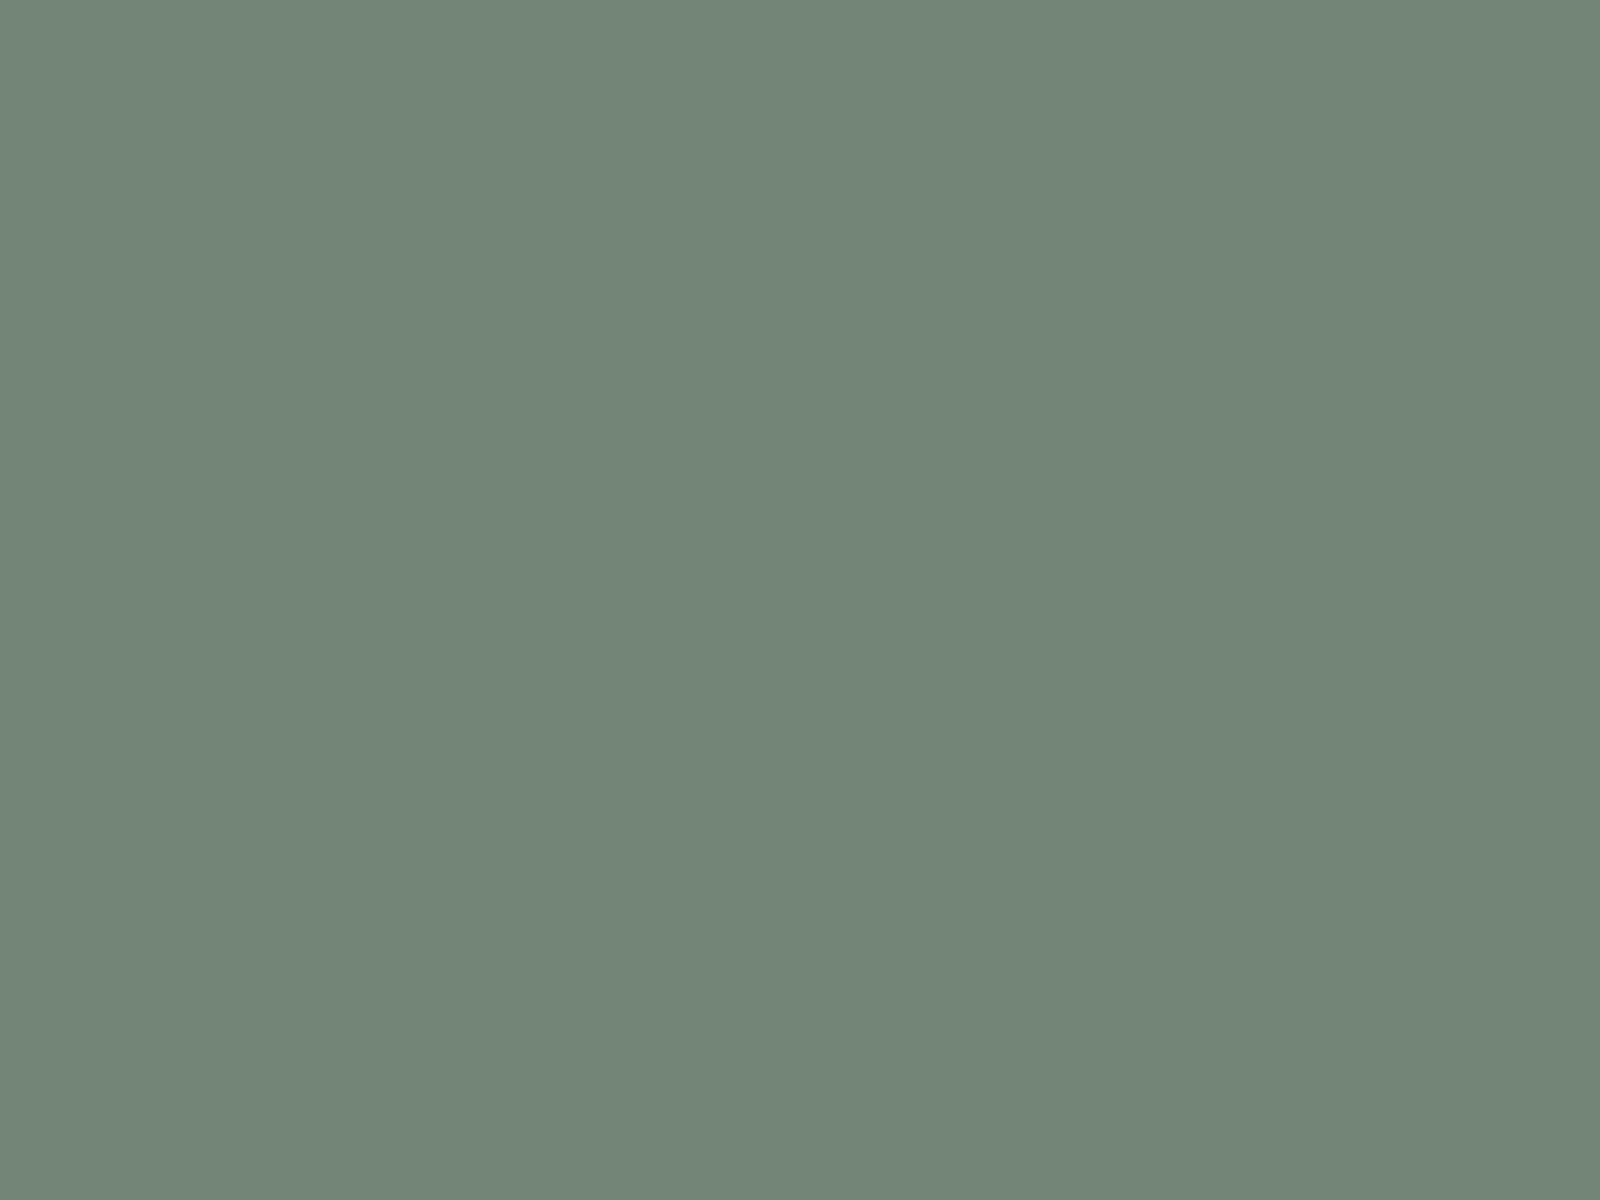 1600x1200 Xanadu Solid Color Background